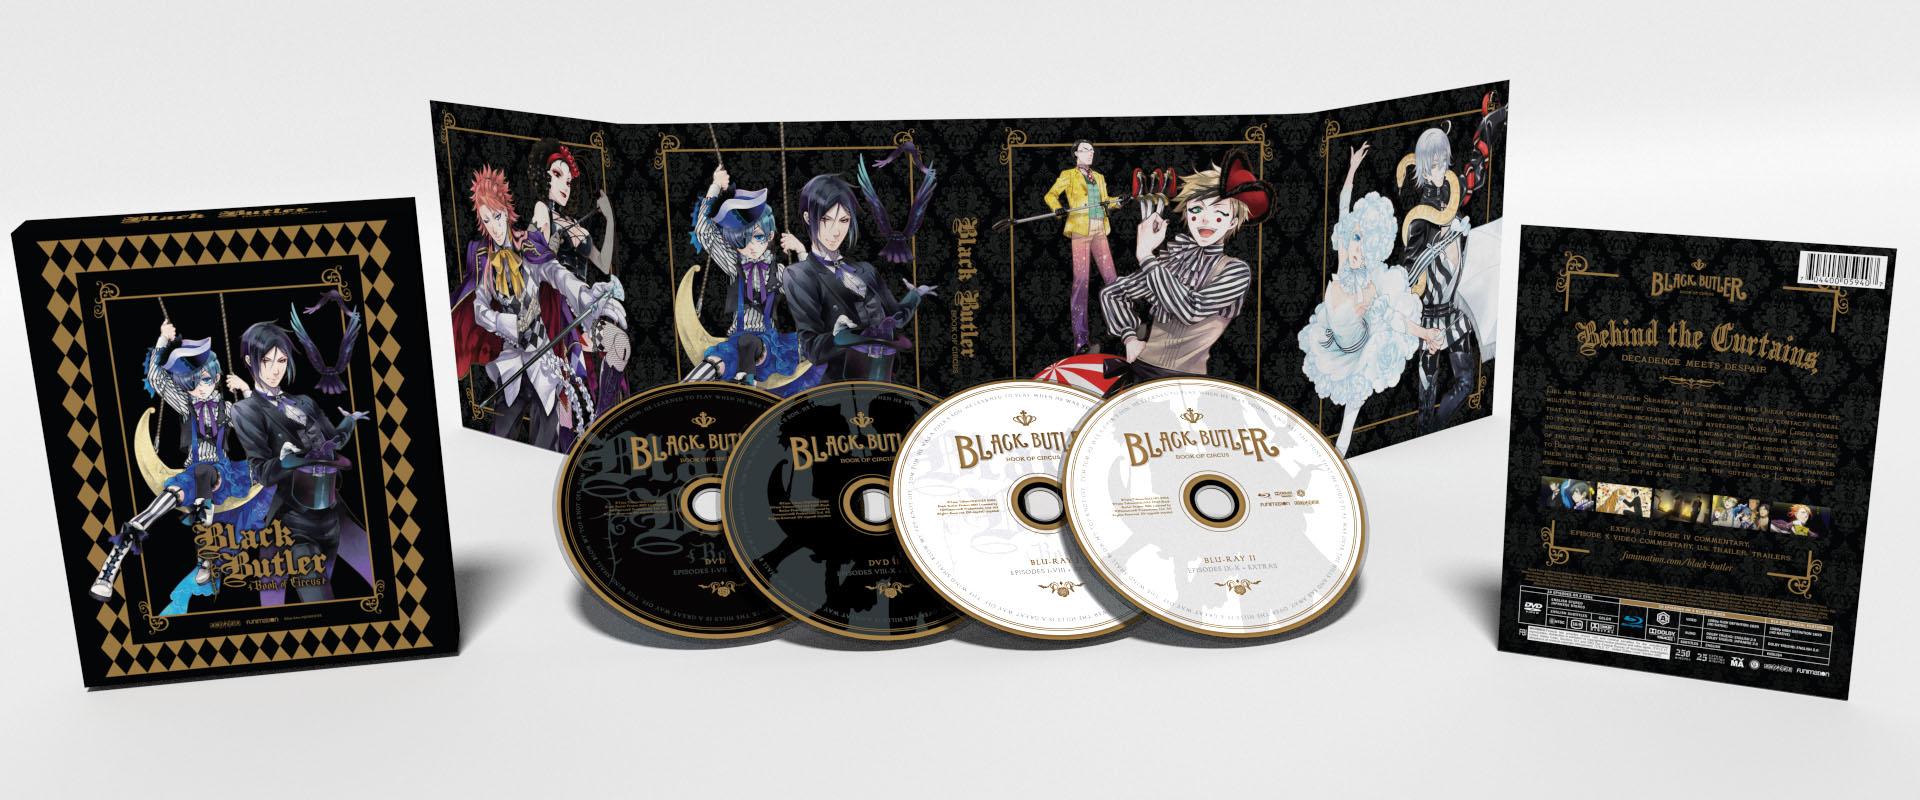 Black Butler Season 3 Limited Edition Blu-ray/DVD